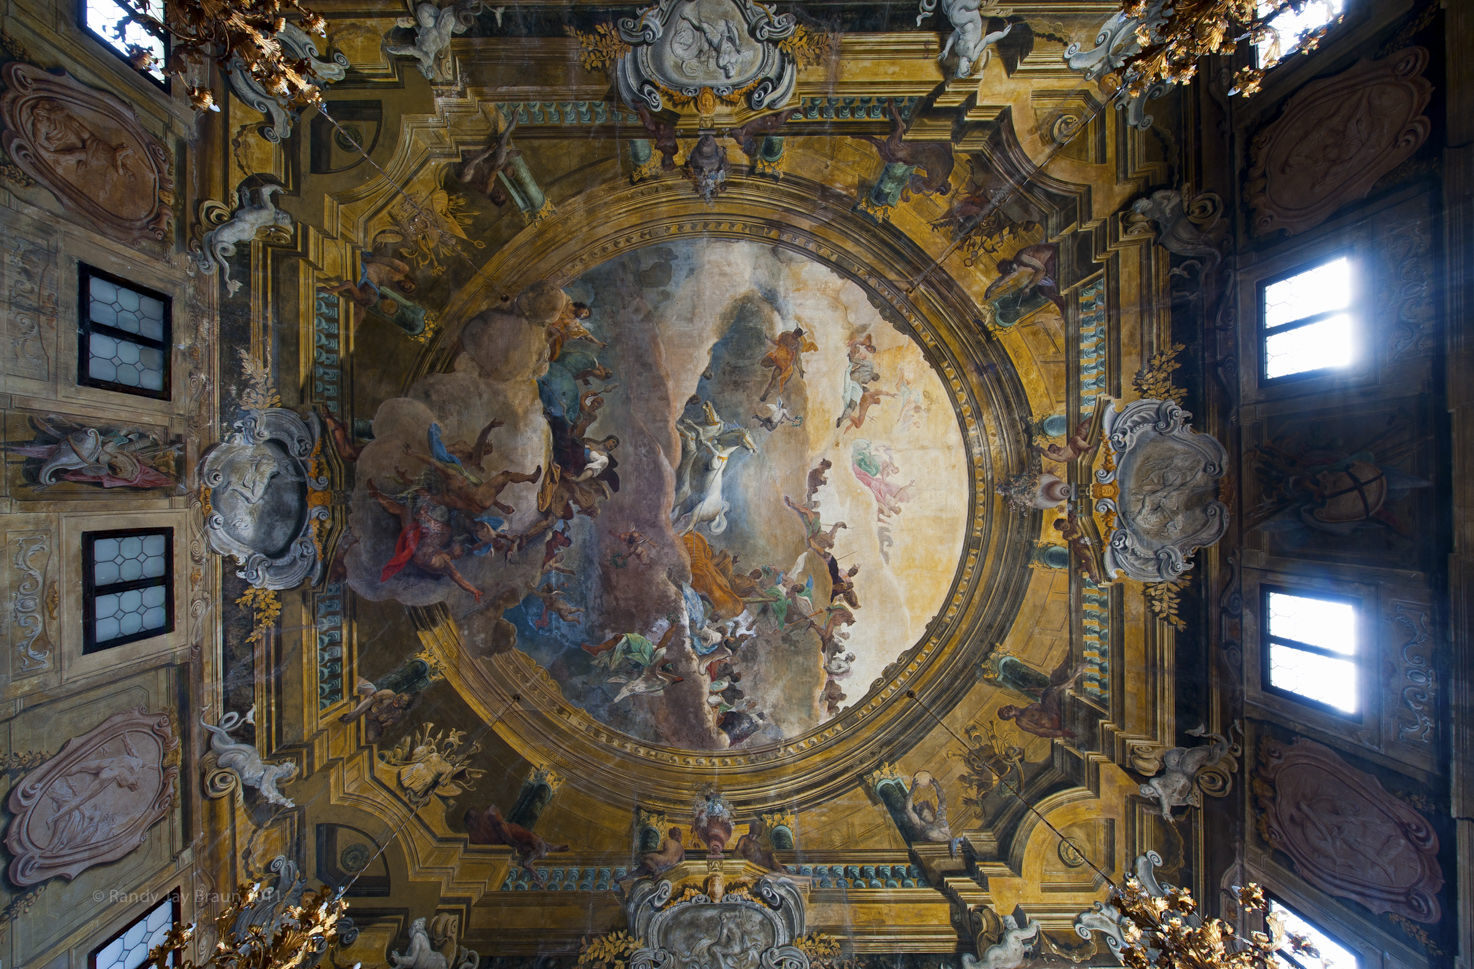 Cà Sagredo, Ballroom with frescoed ceiling